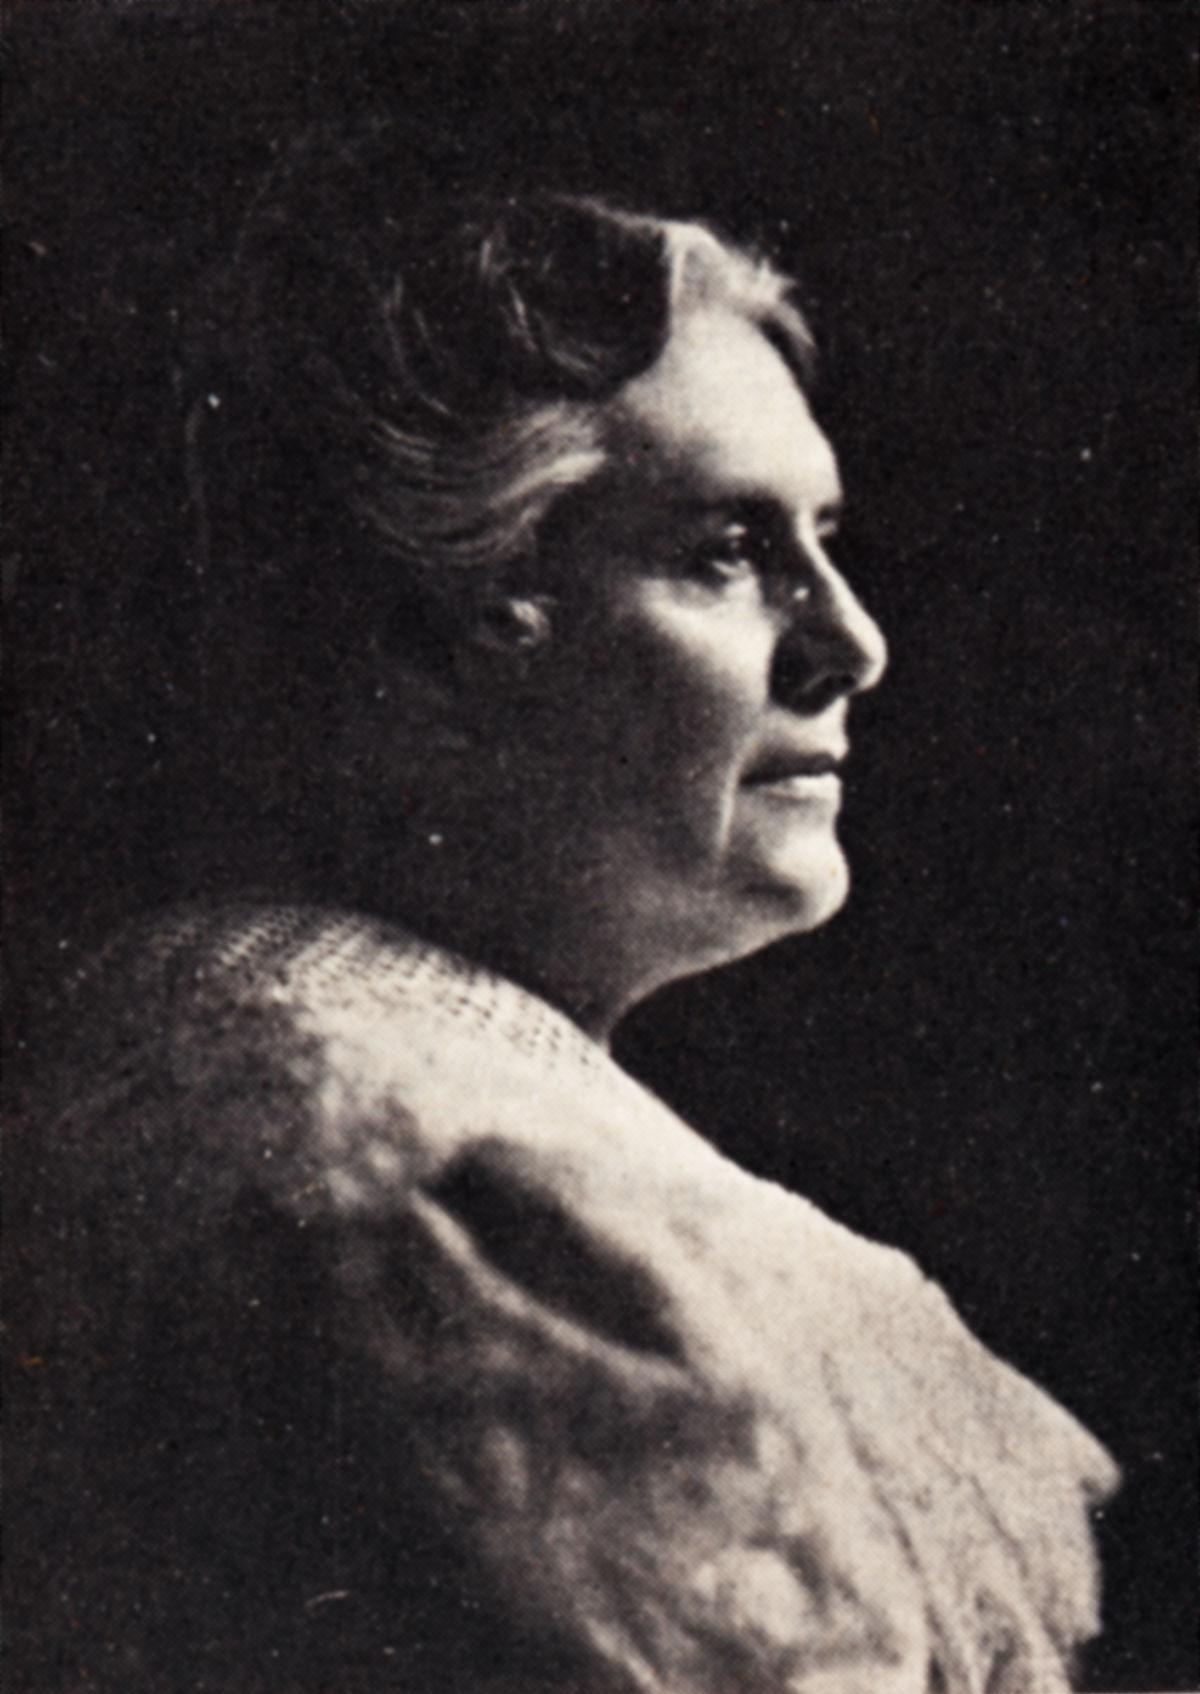 Anna-Botsford-Comstock-1854-1930.jpg